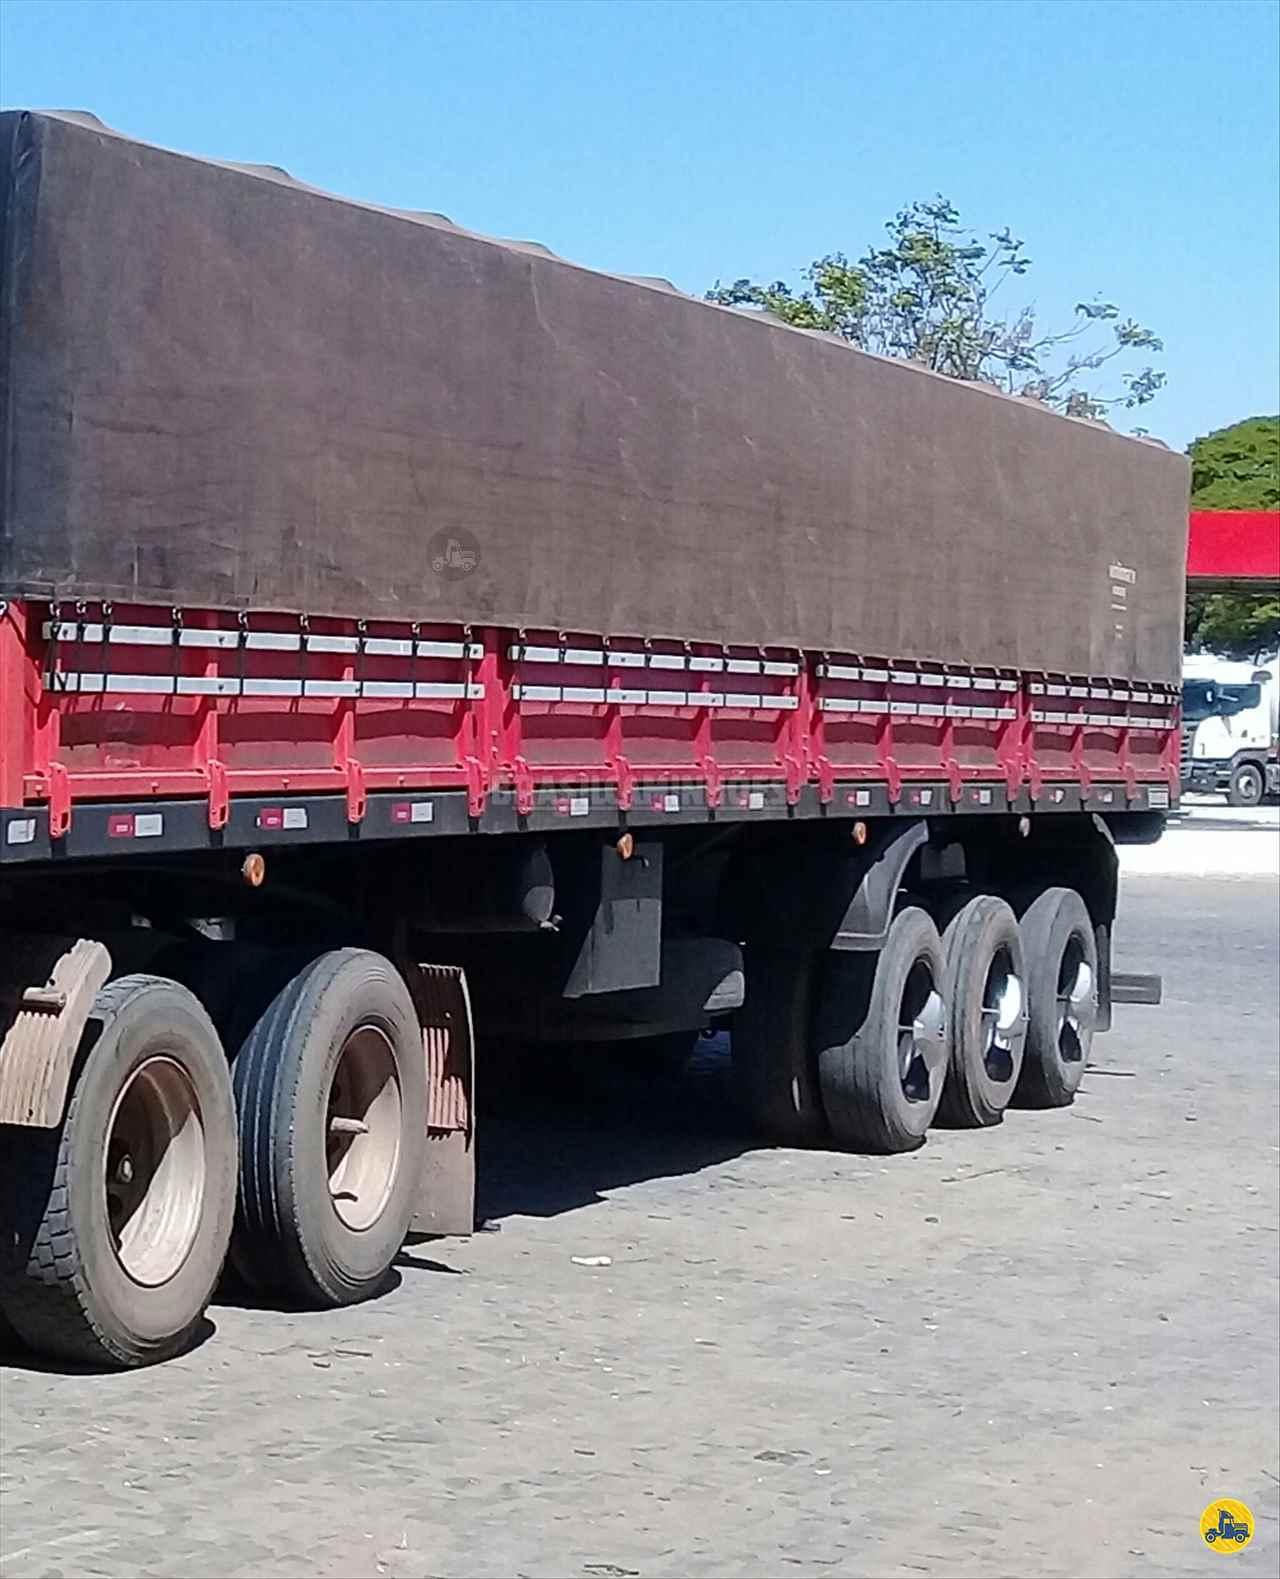 CARRETA SEMI-REBOQUE GRANELEIRO Brasil Caminhões Sinop SINOP MATO GROSSO MT